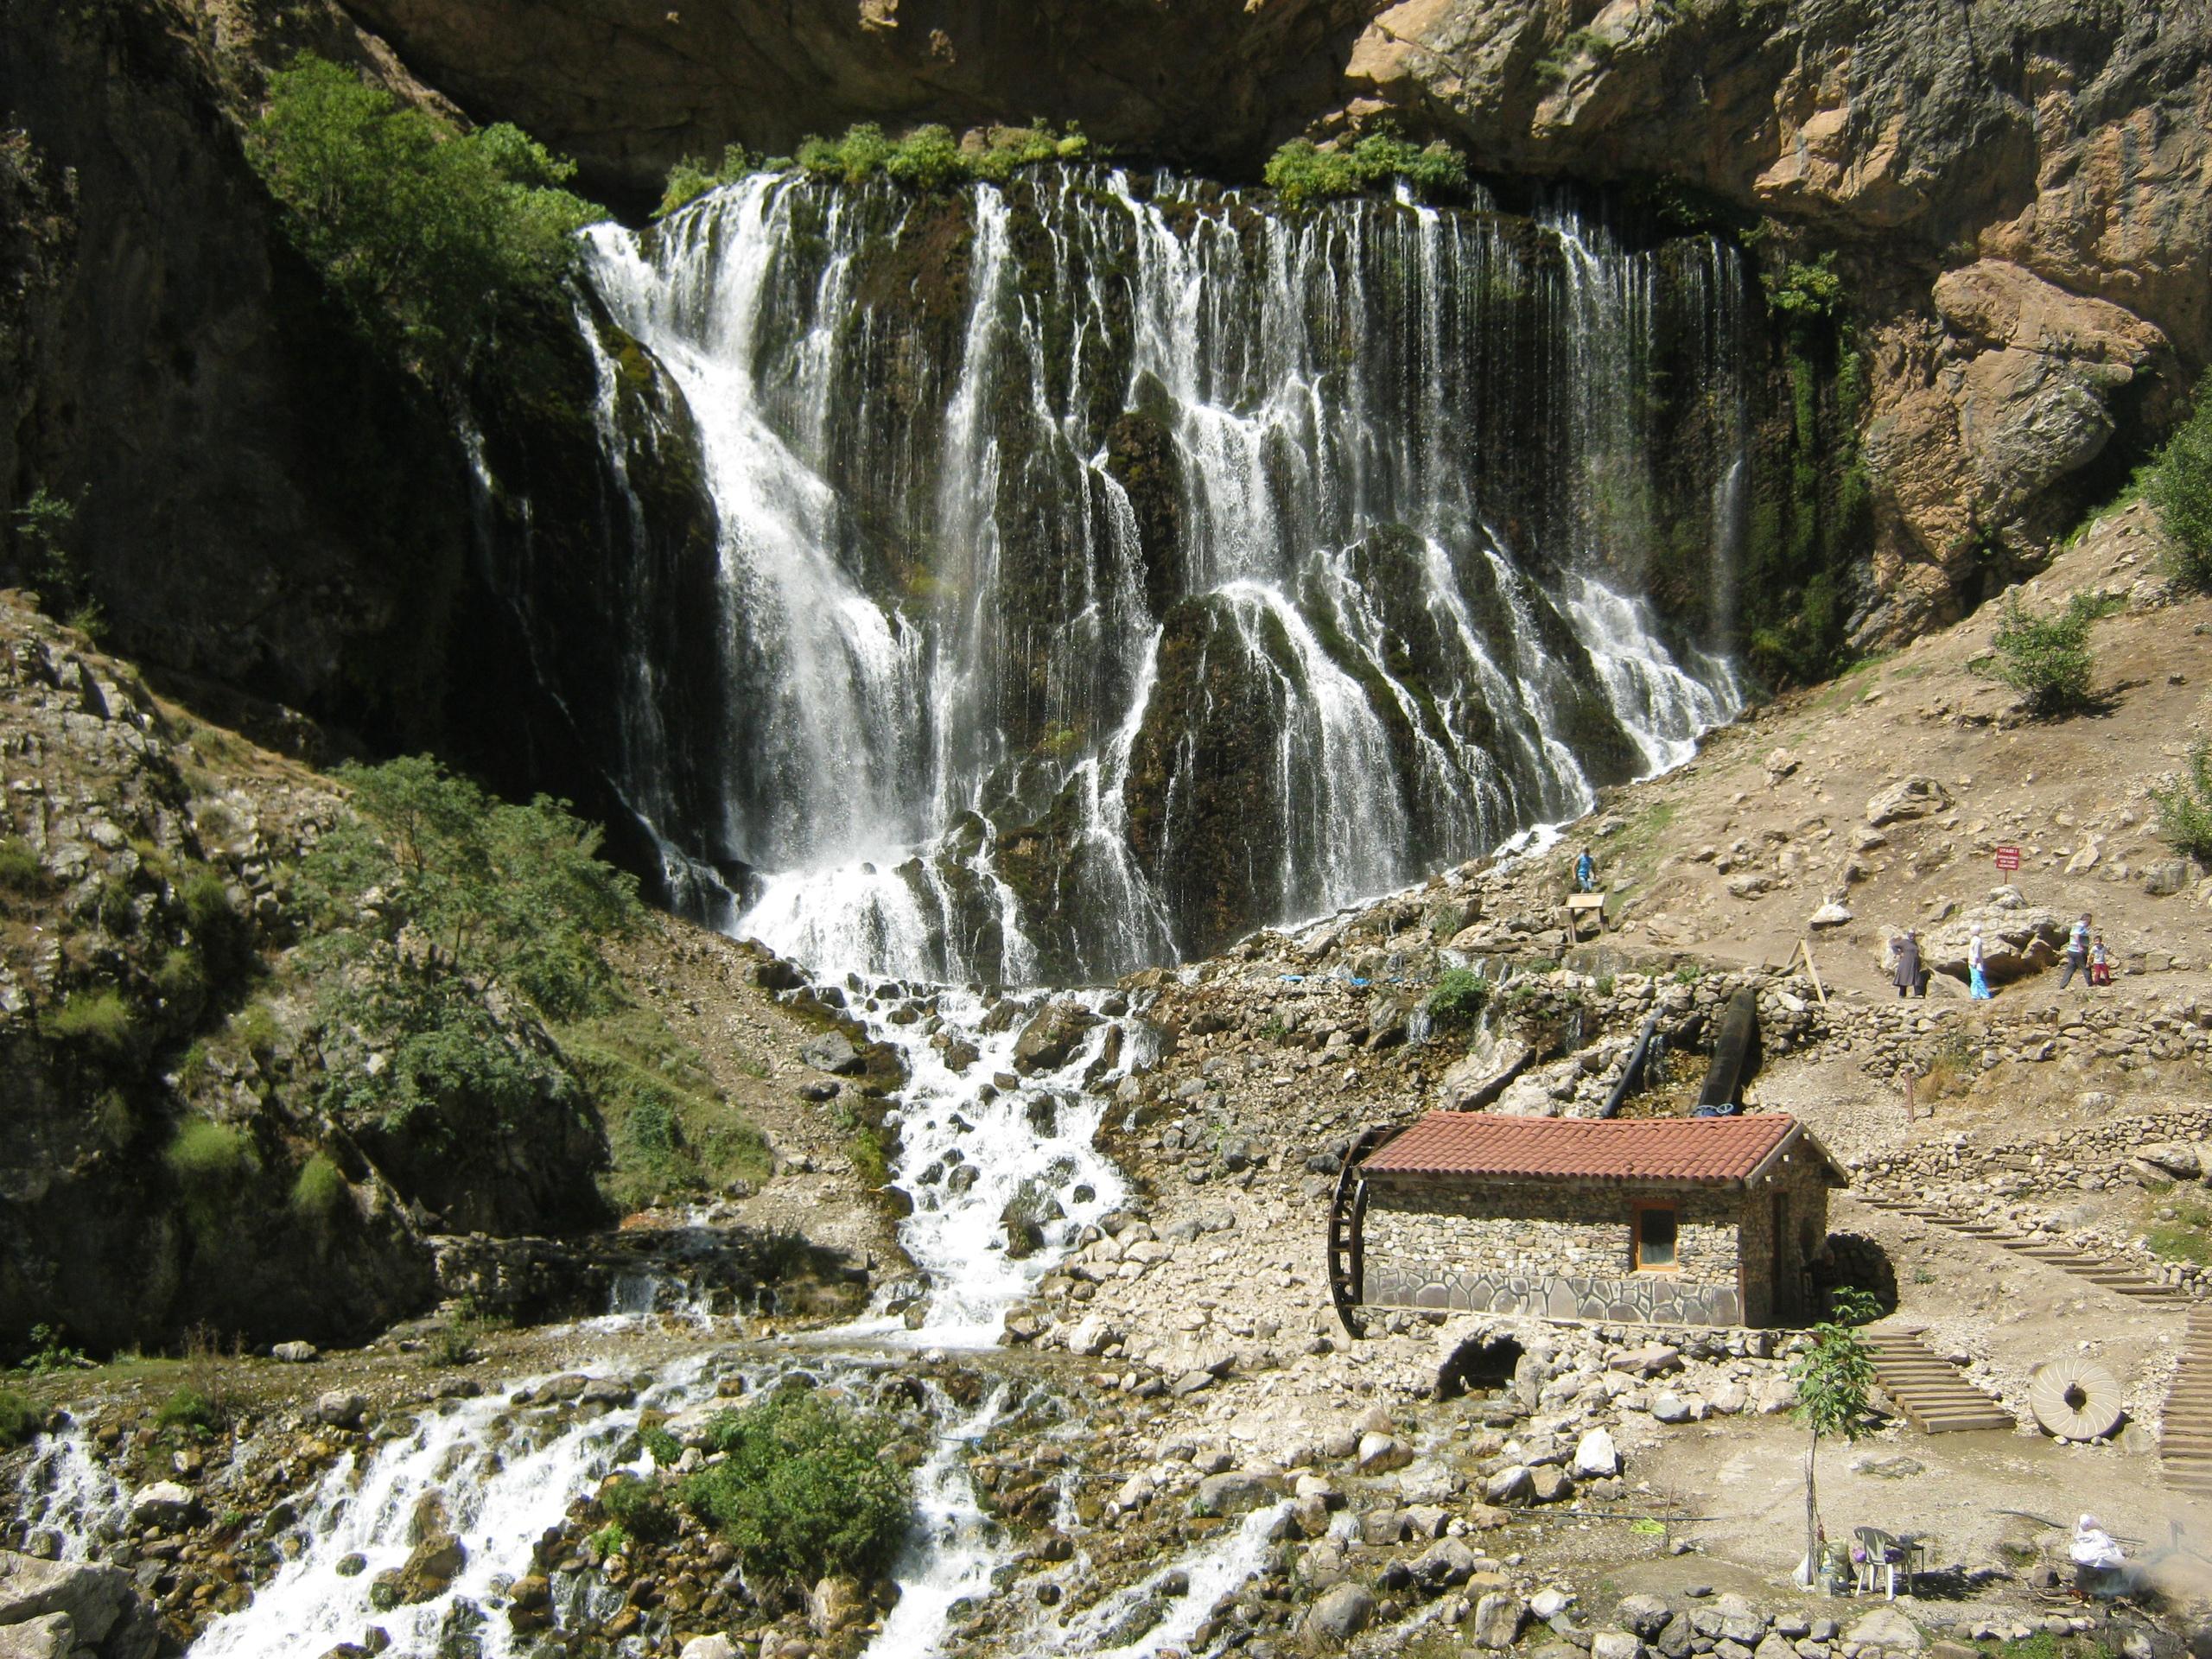 Водопады Капузбаши (их там 5-6 разных)